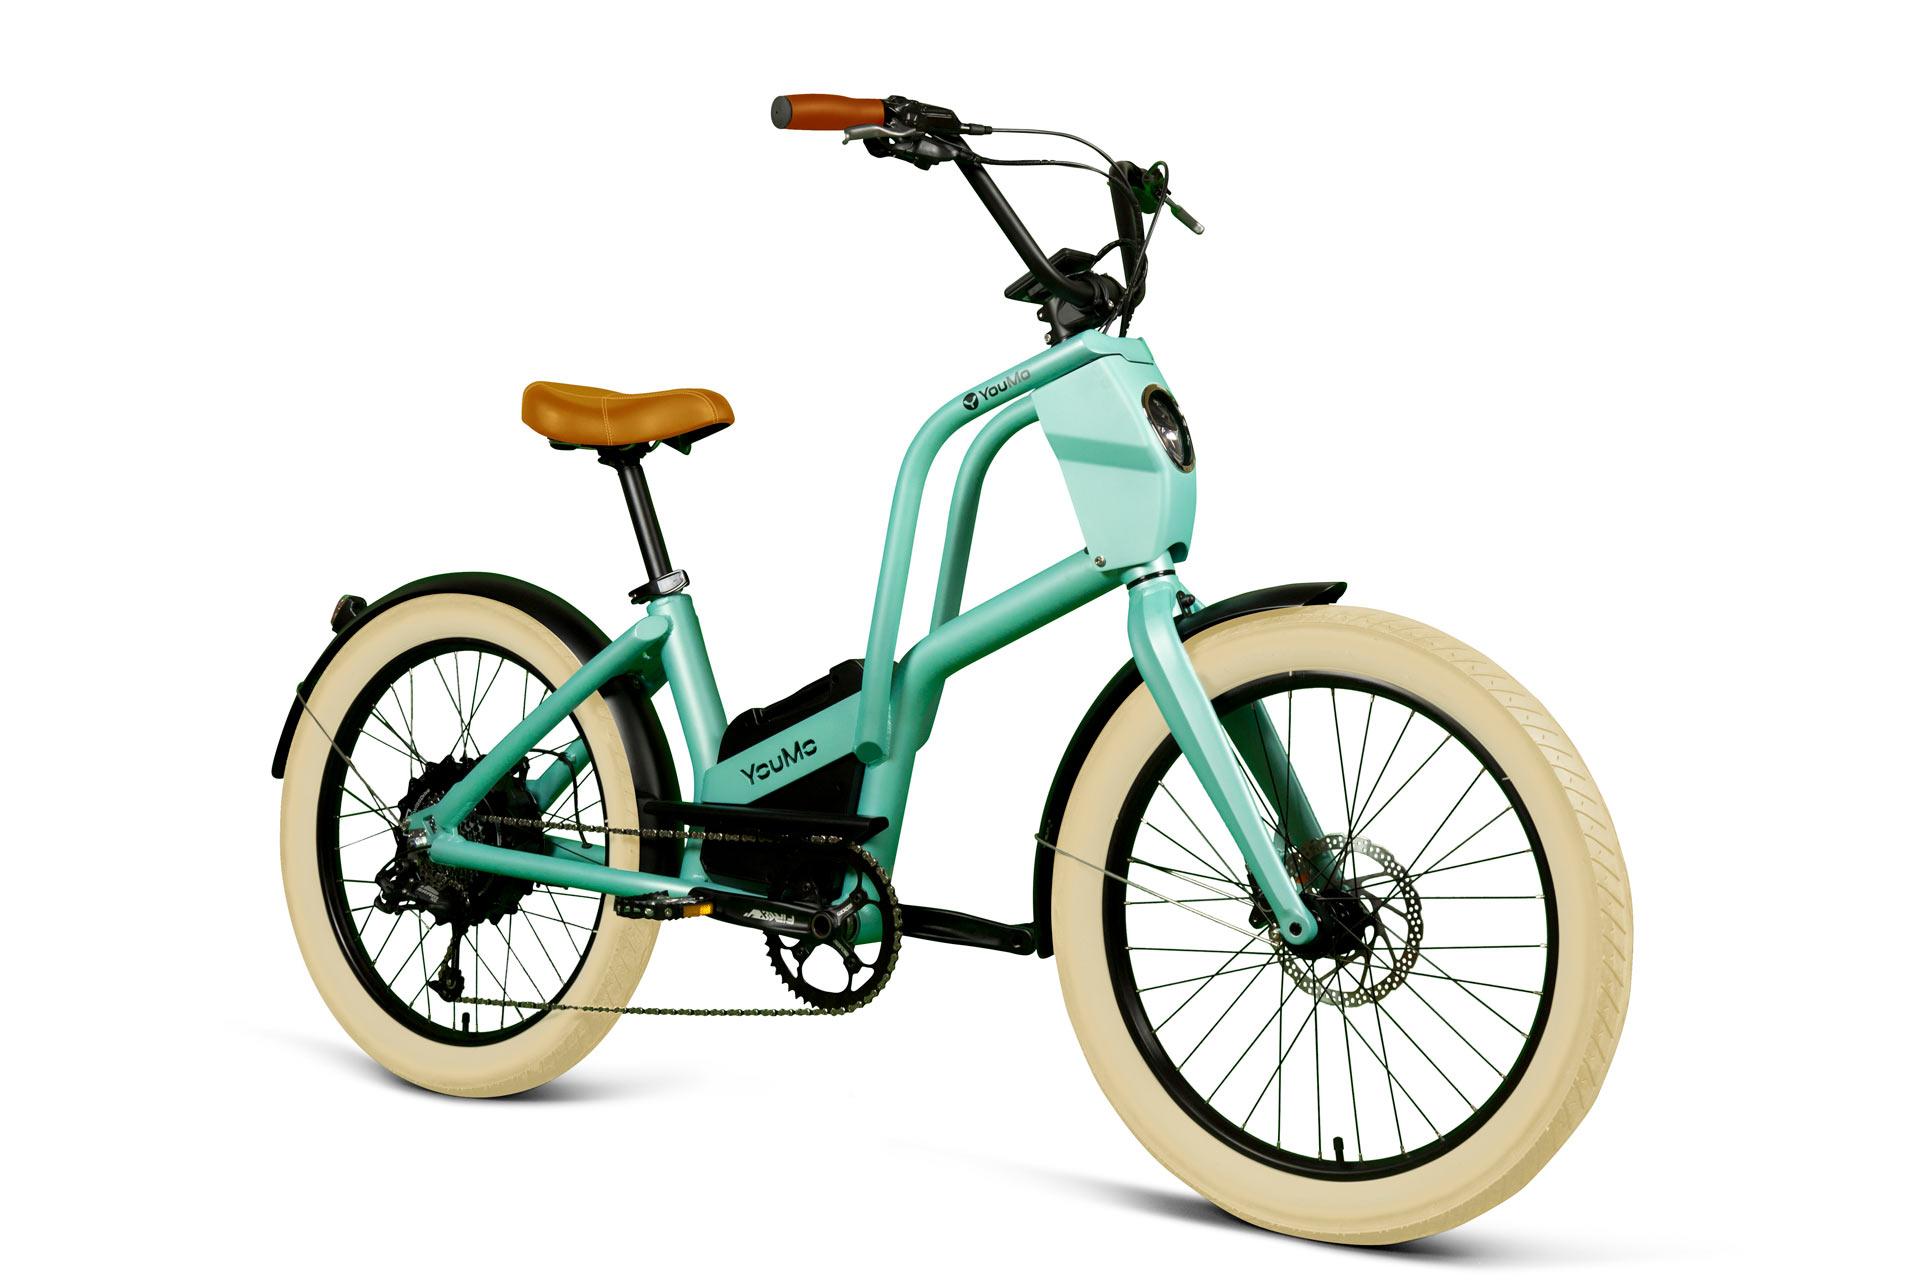 youmo-ebike-green